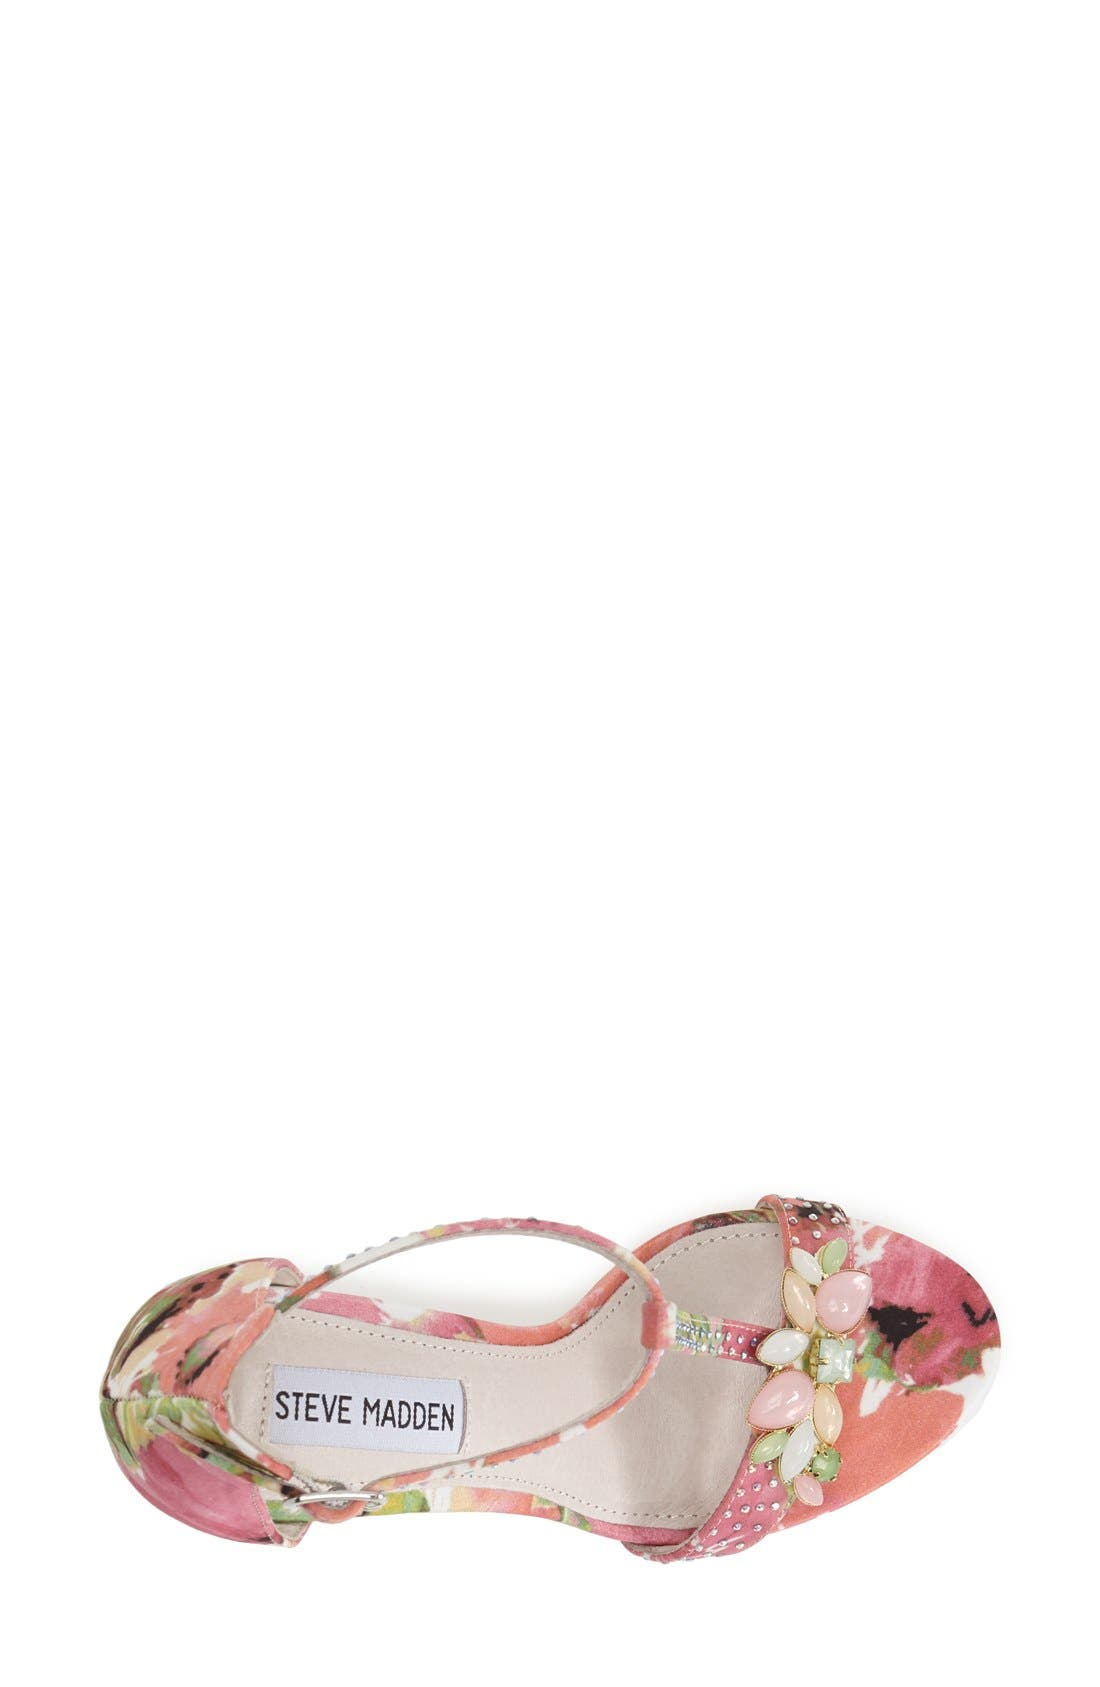 Alternate Image 3  - Steve Madden 'Shawna' Embellished T-Strap Sandal (Women)